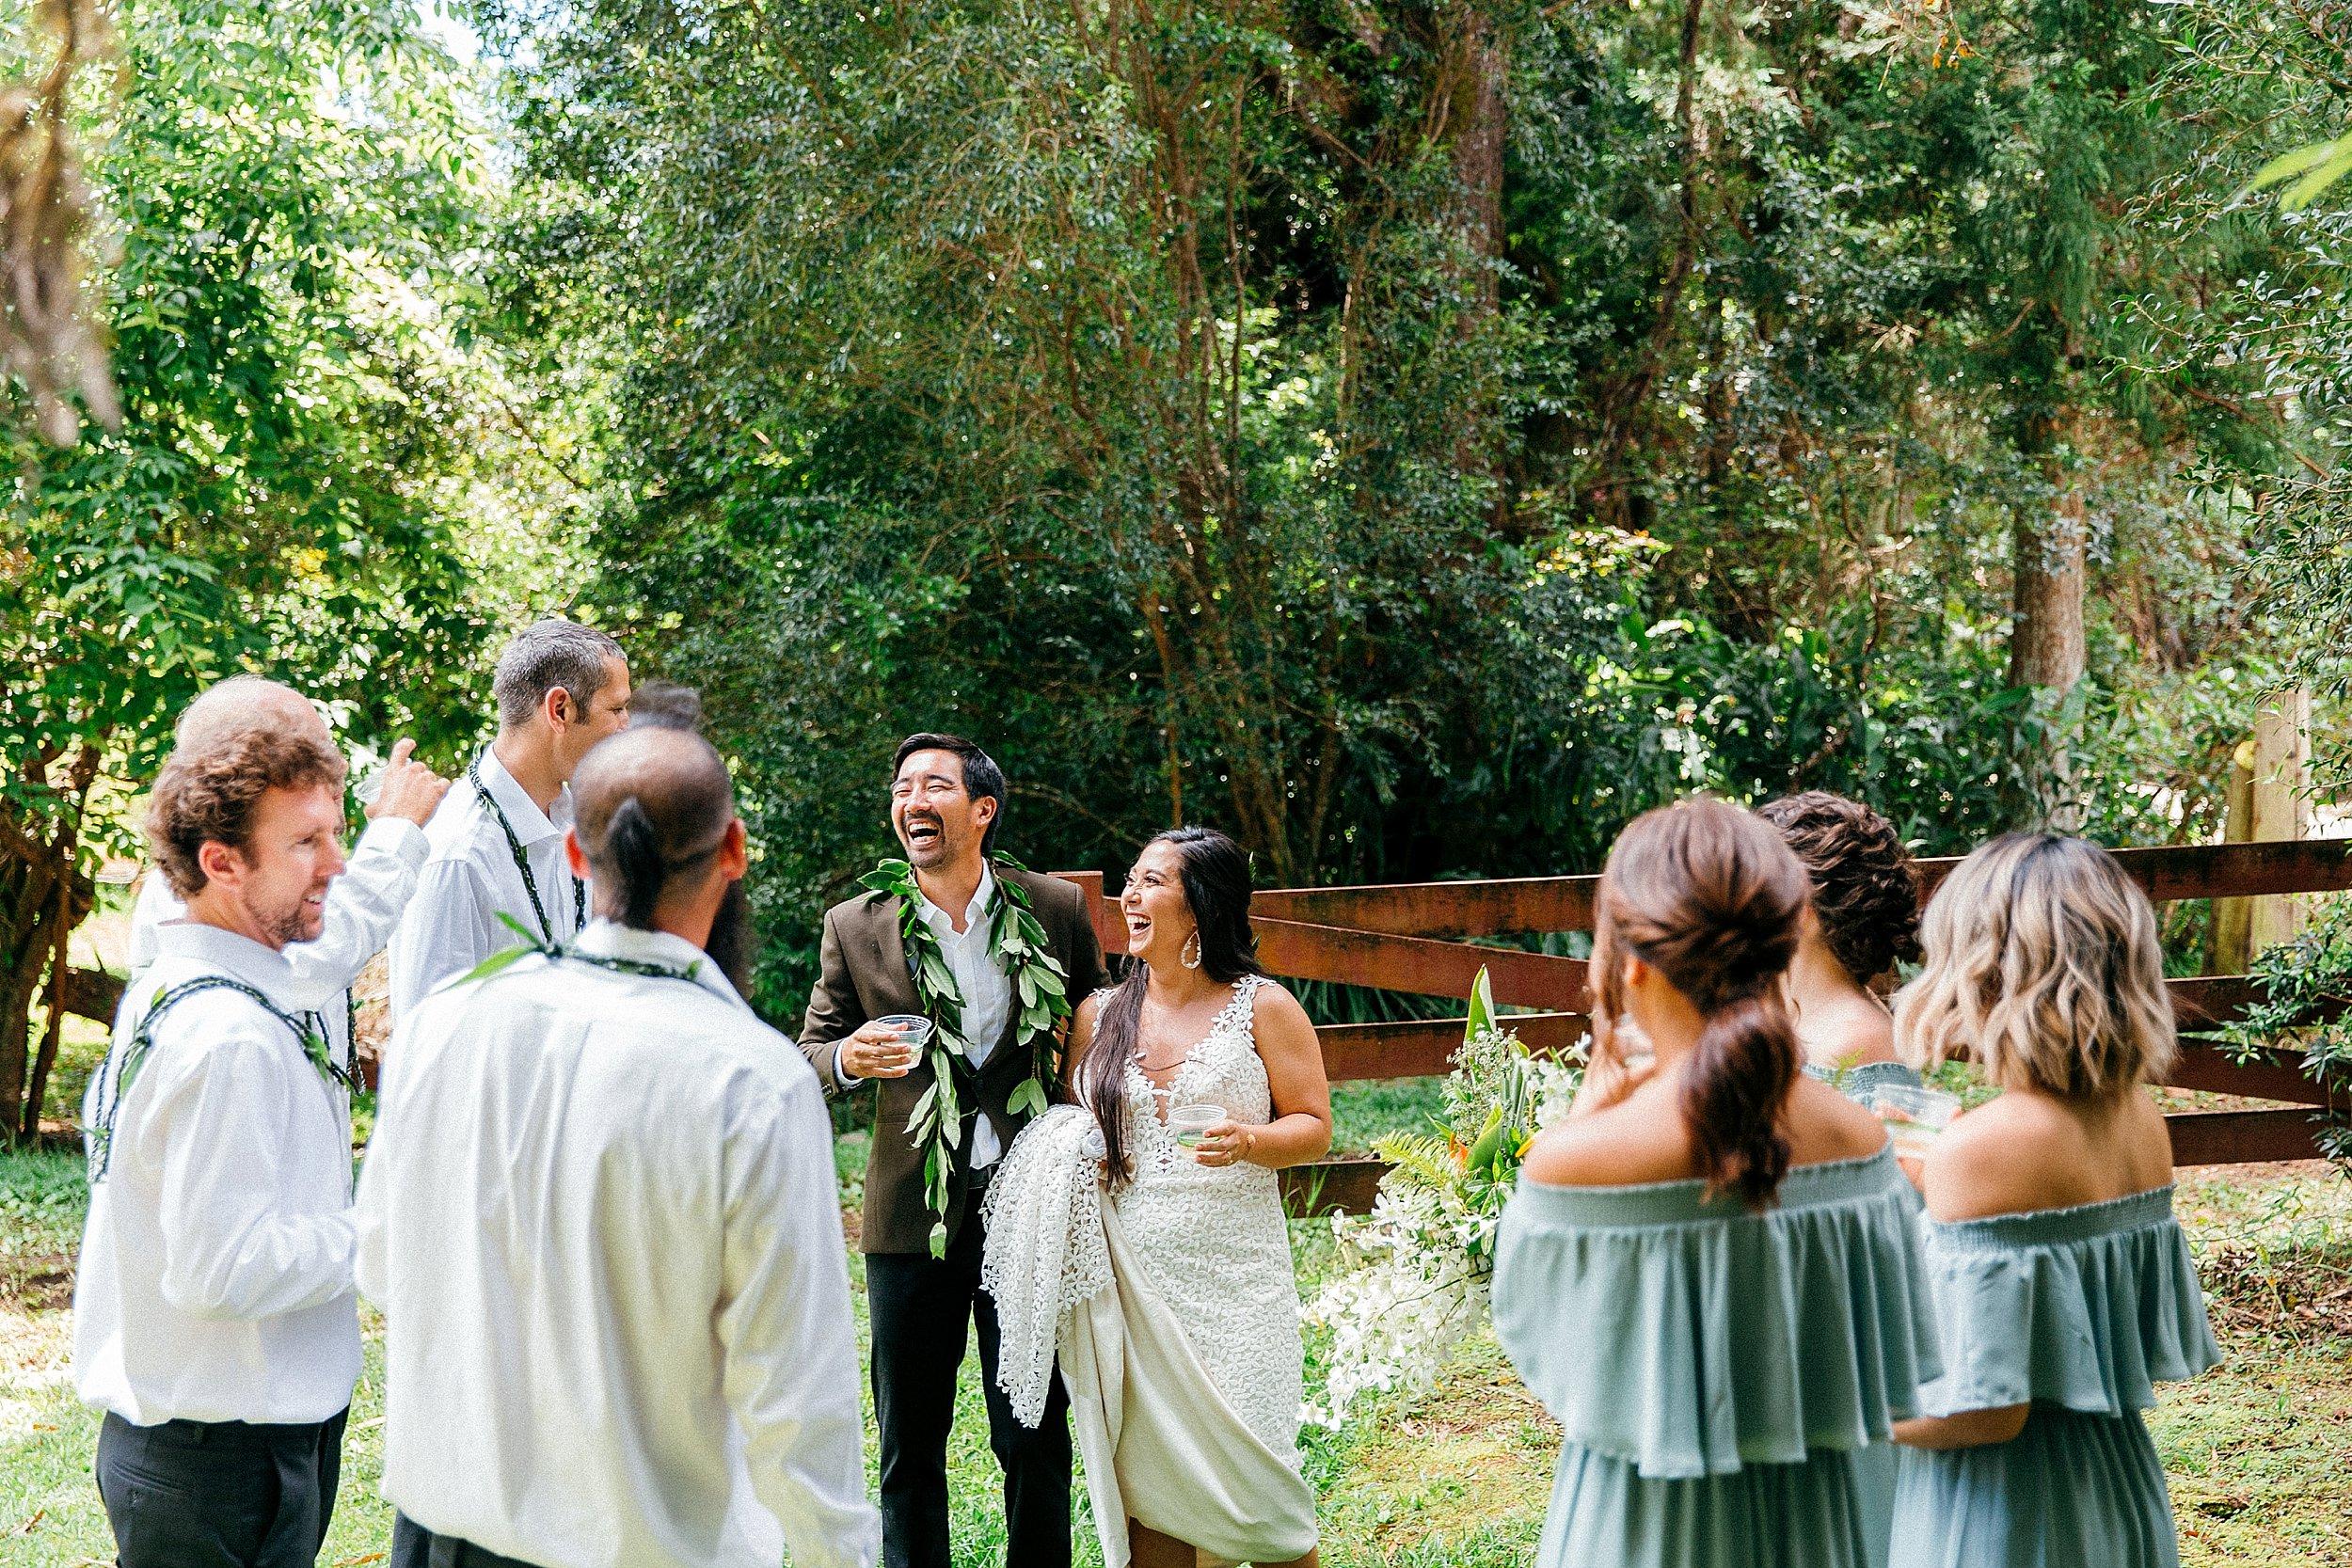 Kirsten & Kyle - Backyard Wedding at Anna Ranch and Mauna Kea